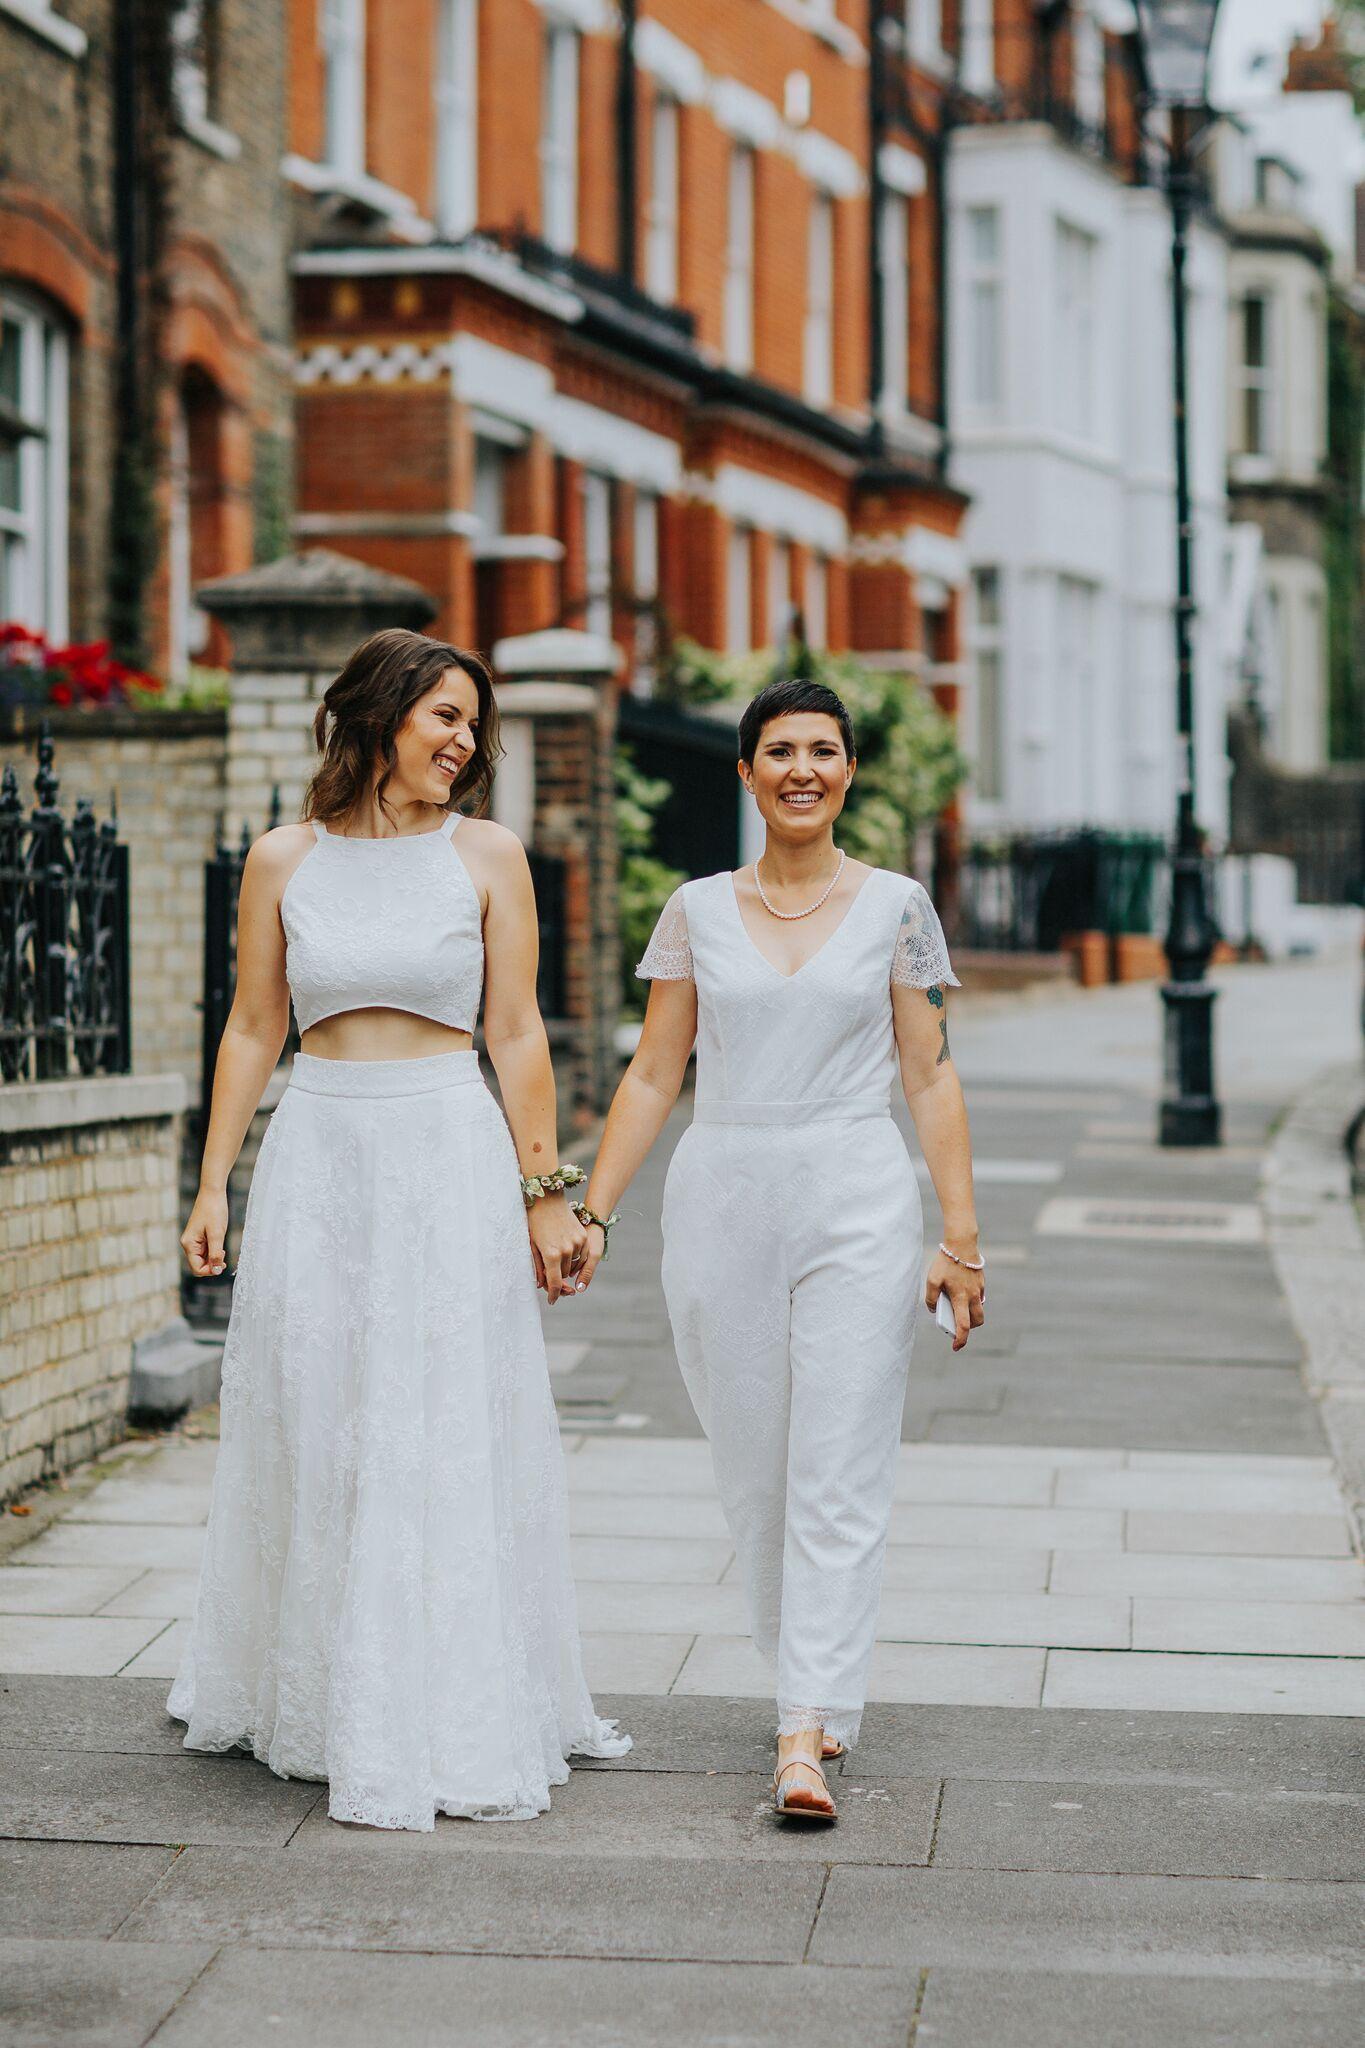 Brides Of Ollichon Emma And Roxy Alternative Wedding Dresses